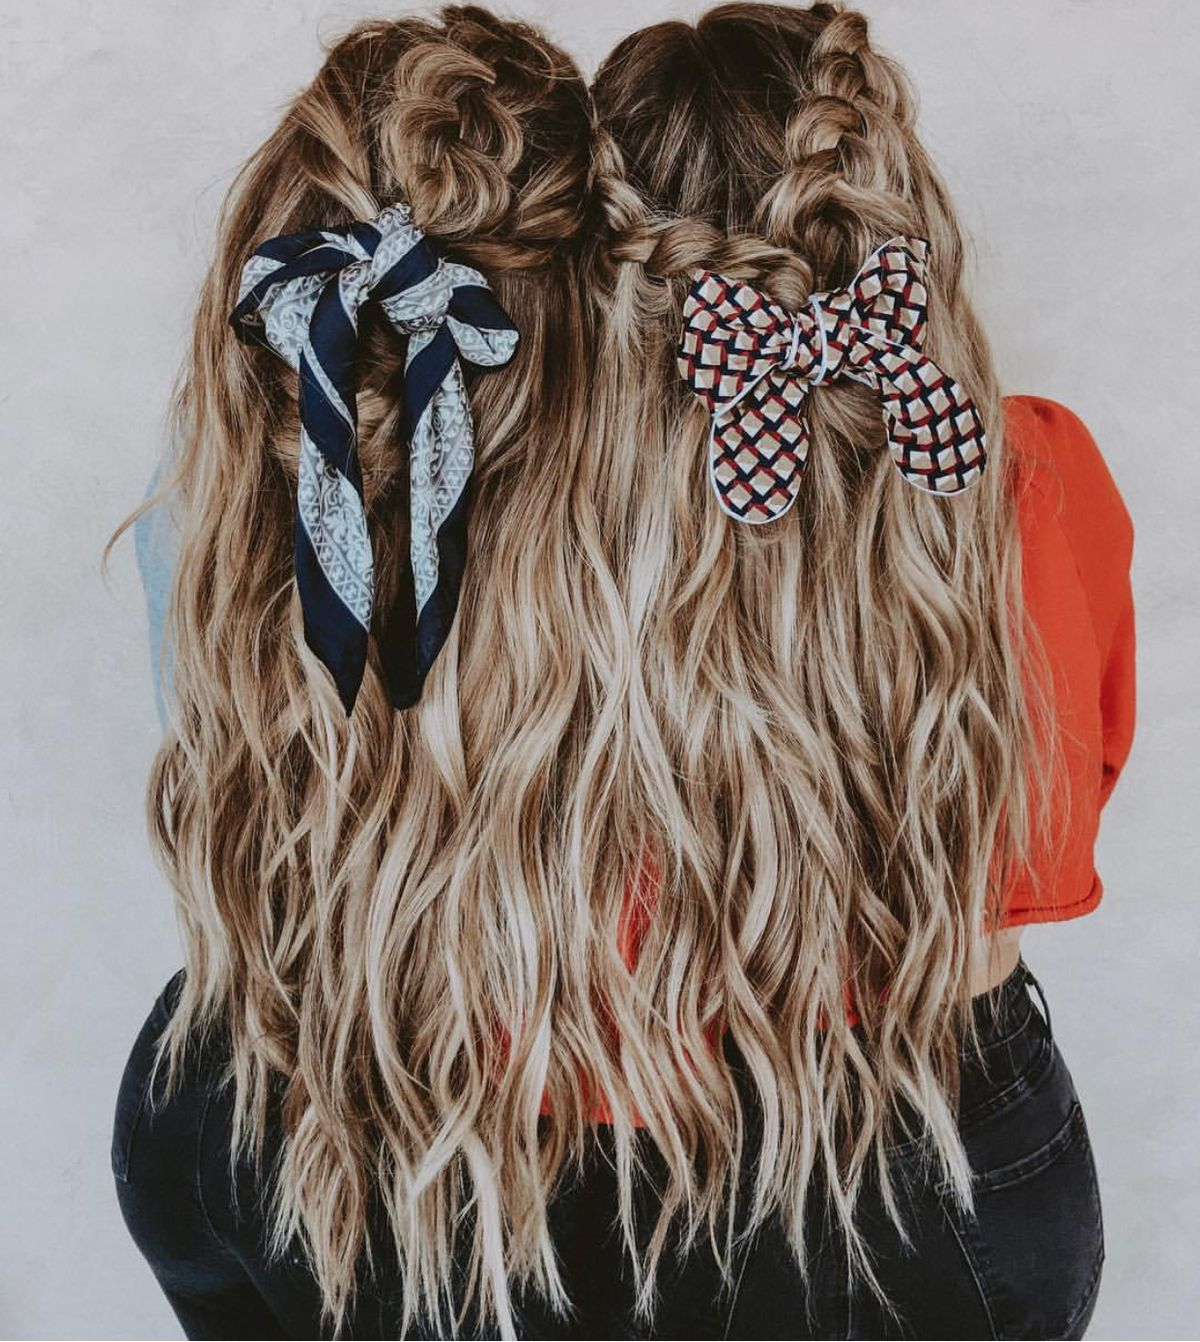 Hair Inspiration 2019-03-21 07:12:53